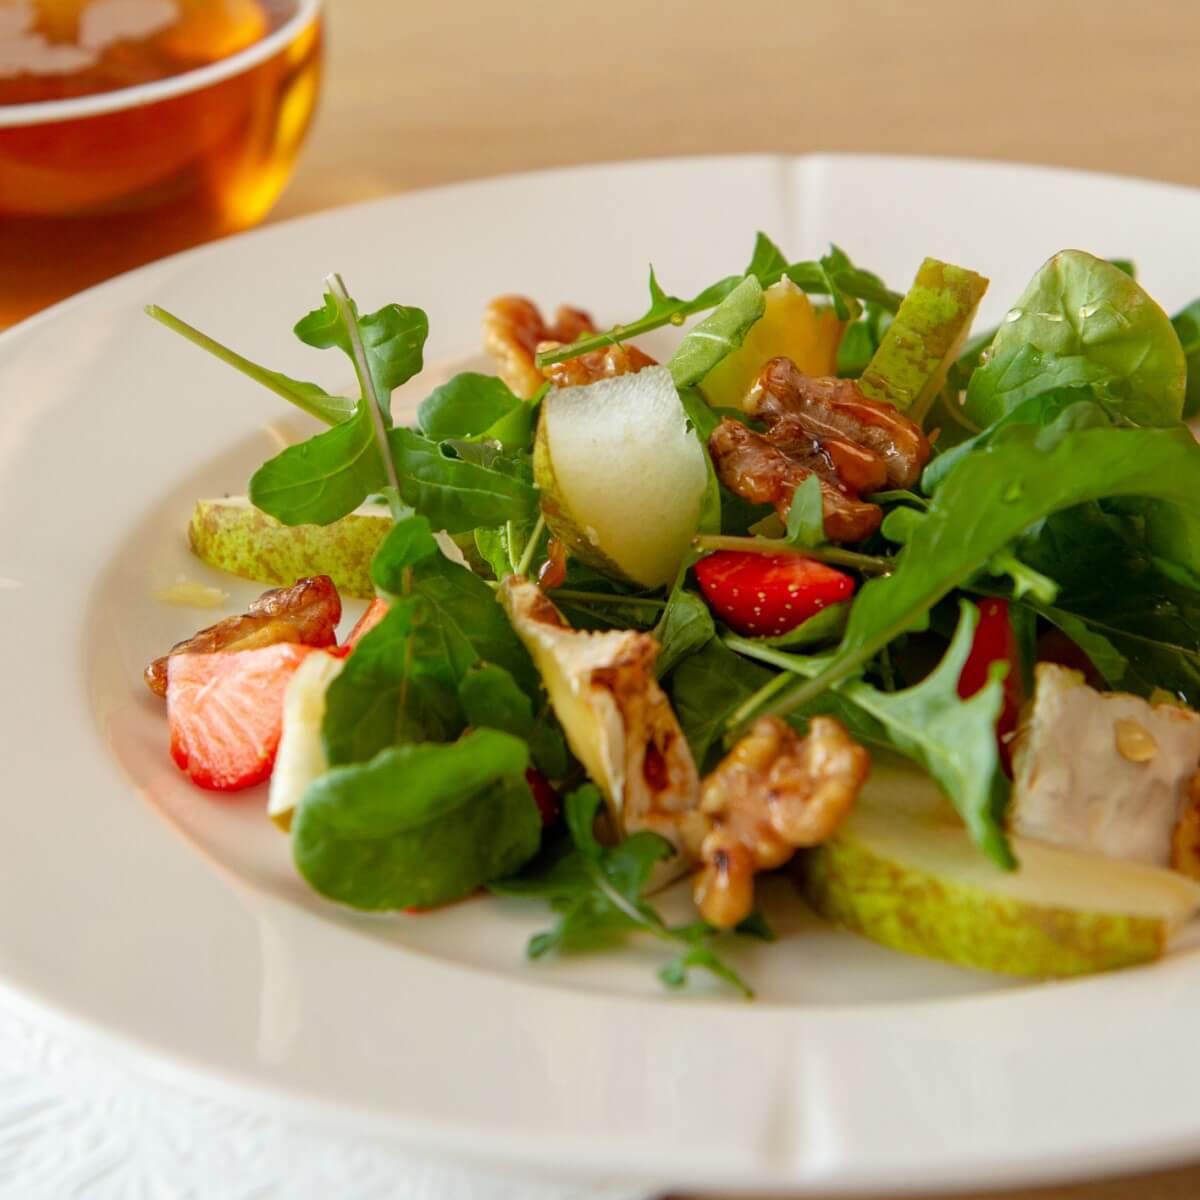 Ruccolasalat med pærer, chevre og glasserte valnøtter